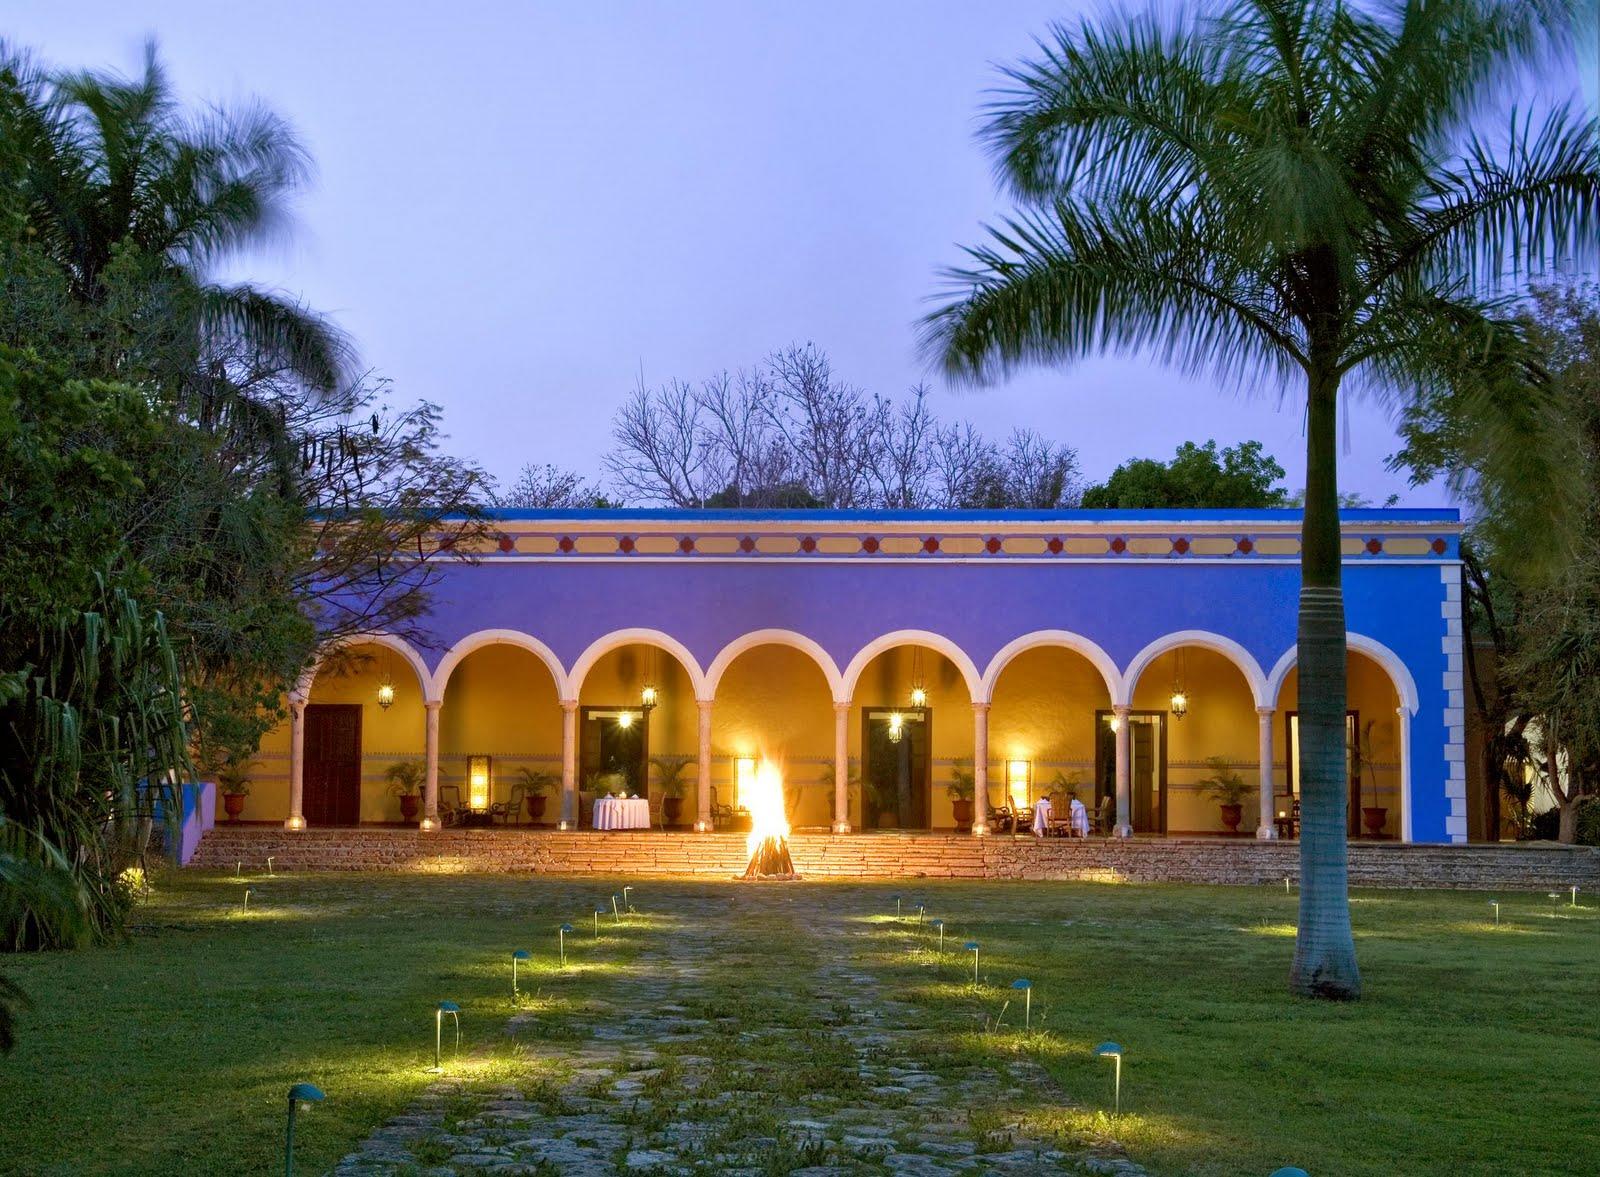 1000 images about haciendas on pinterest for Colores para fachadas